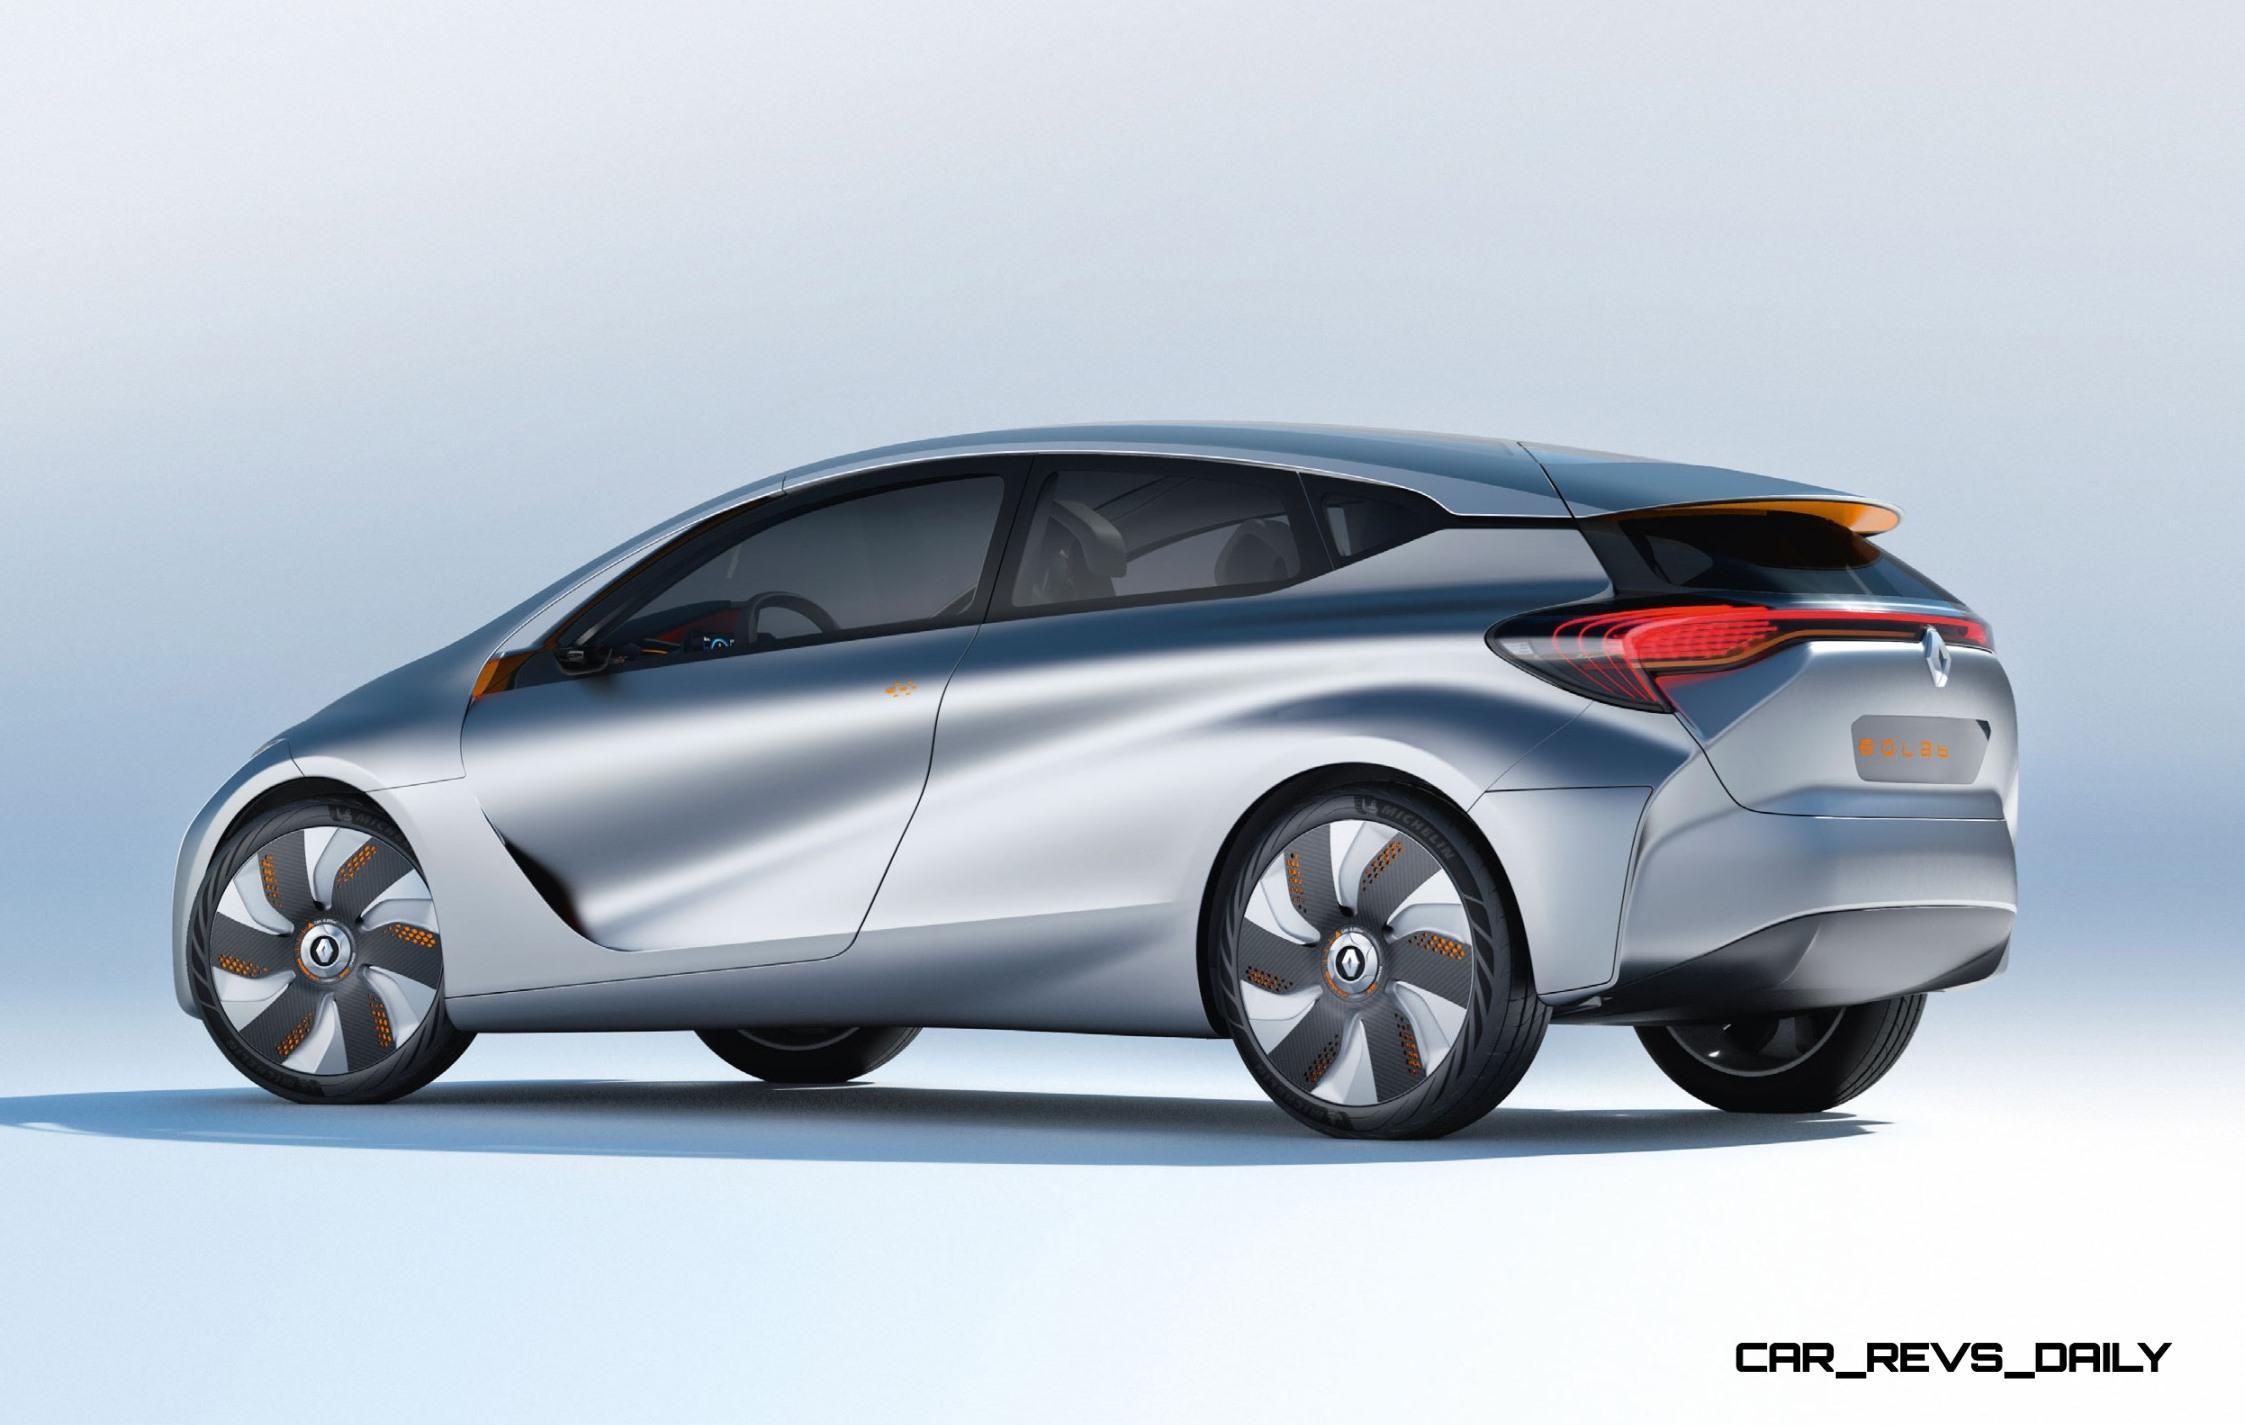 2014 Renault Eolab Concept Is Ultra-Aerodynamic Innovation